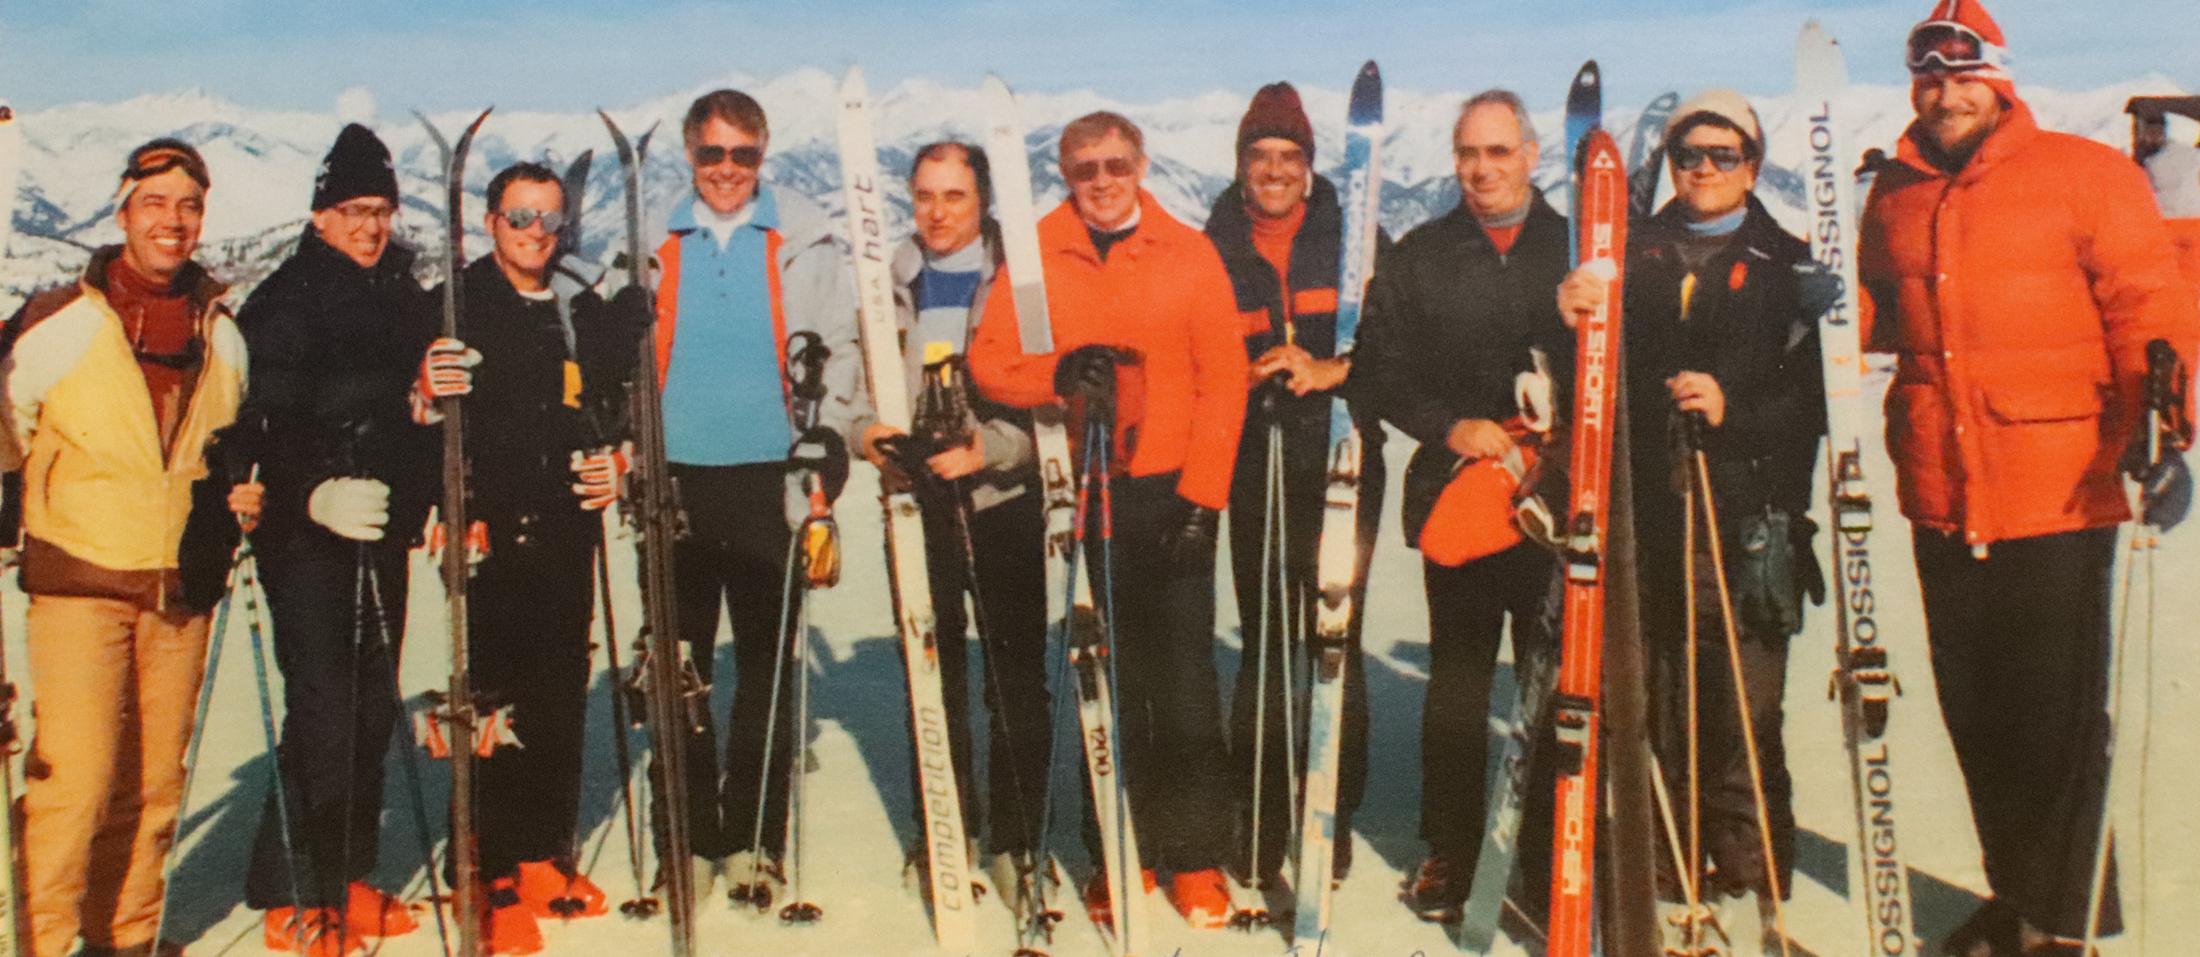 Cedar Valley Ski Club caps half-century journey